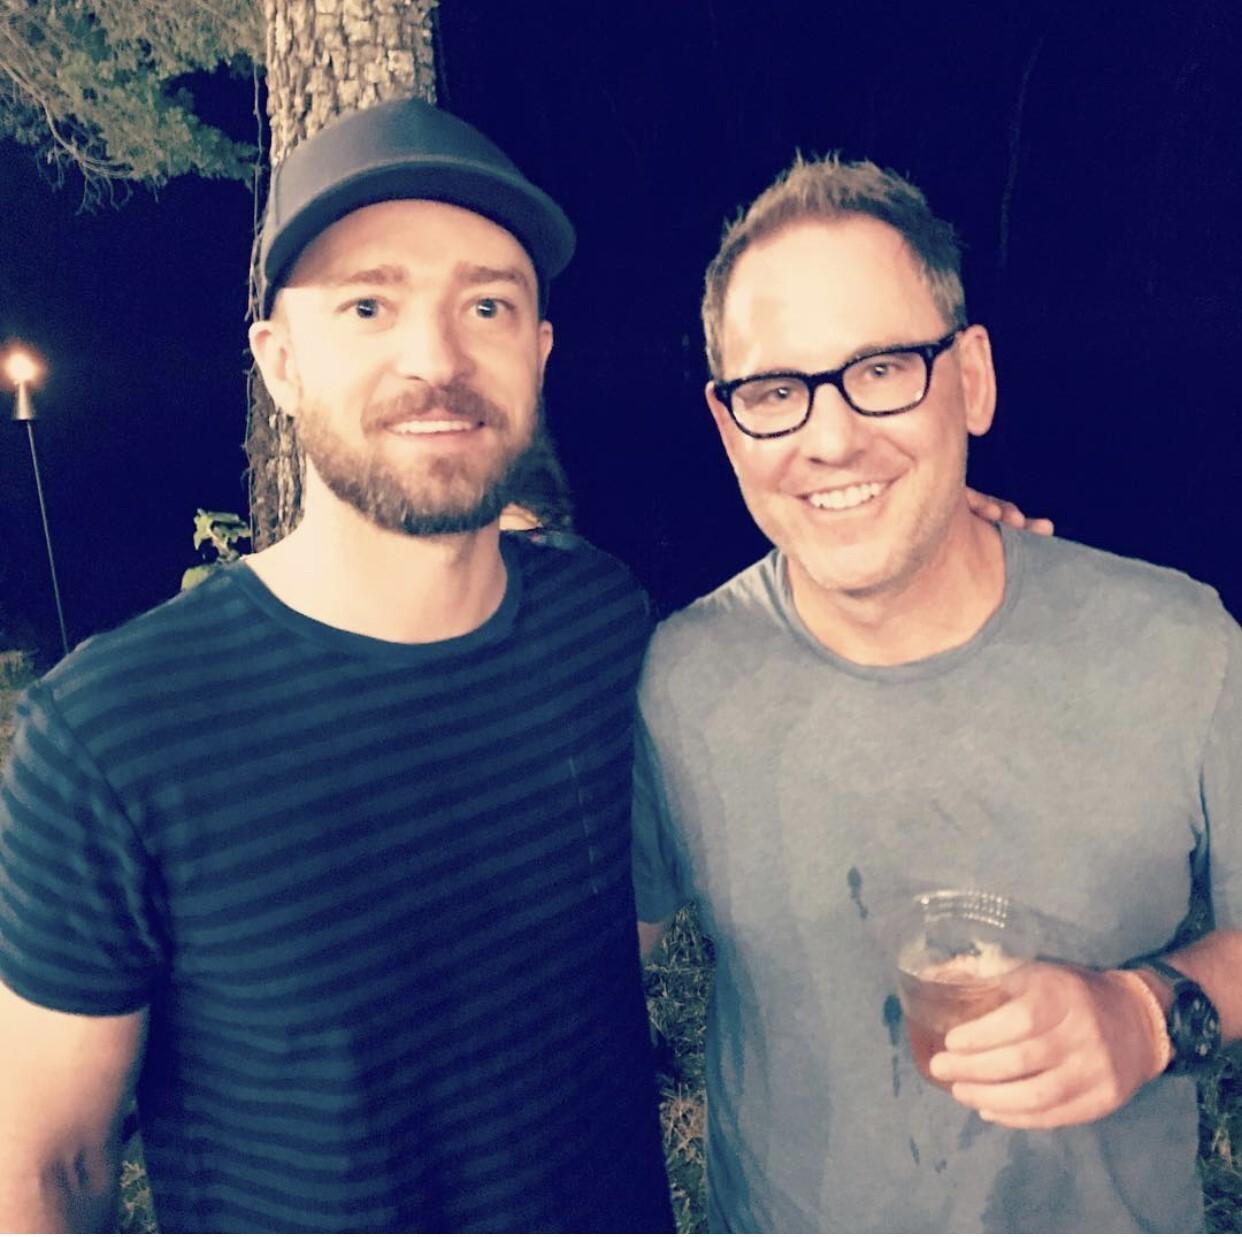 Tucson restaurateur Sam Fox with Justin Timberlake